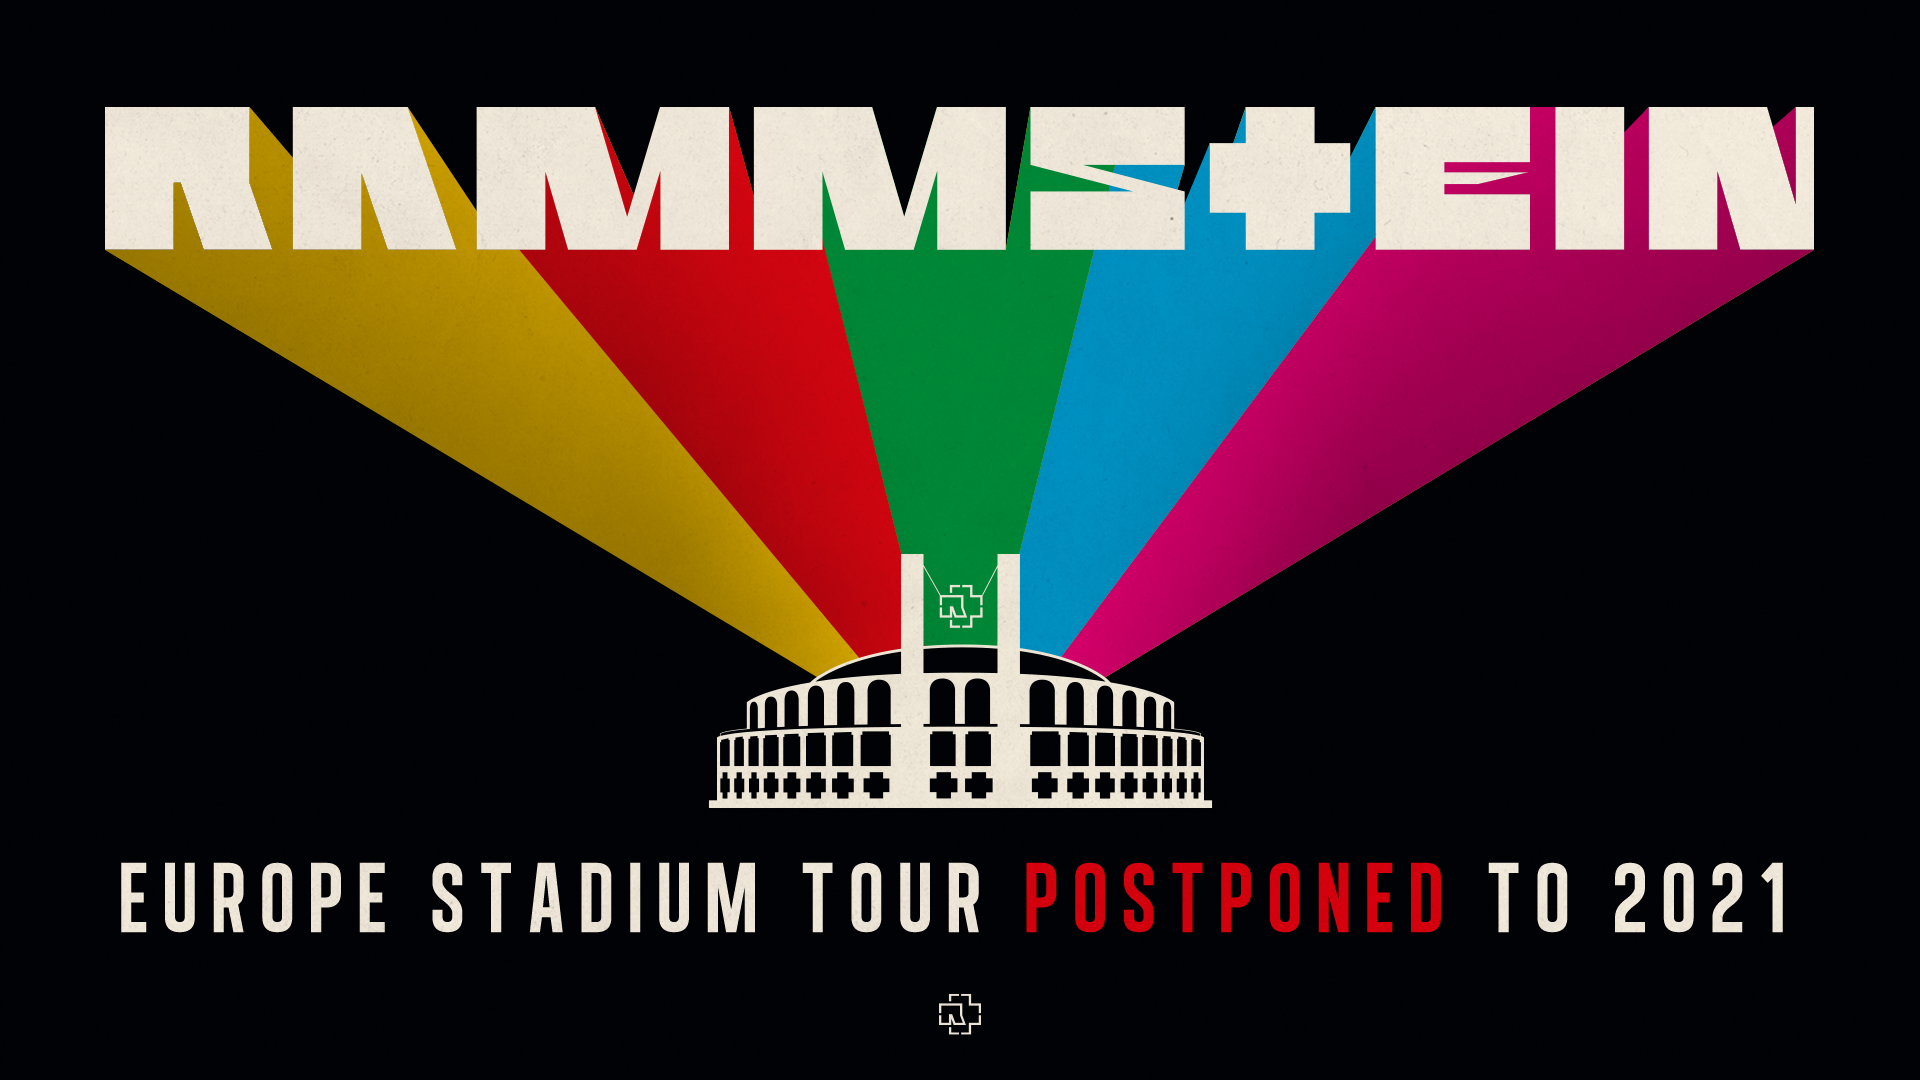 Rammstein Wien 2021 Tickets